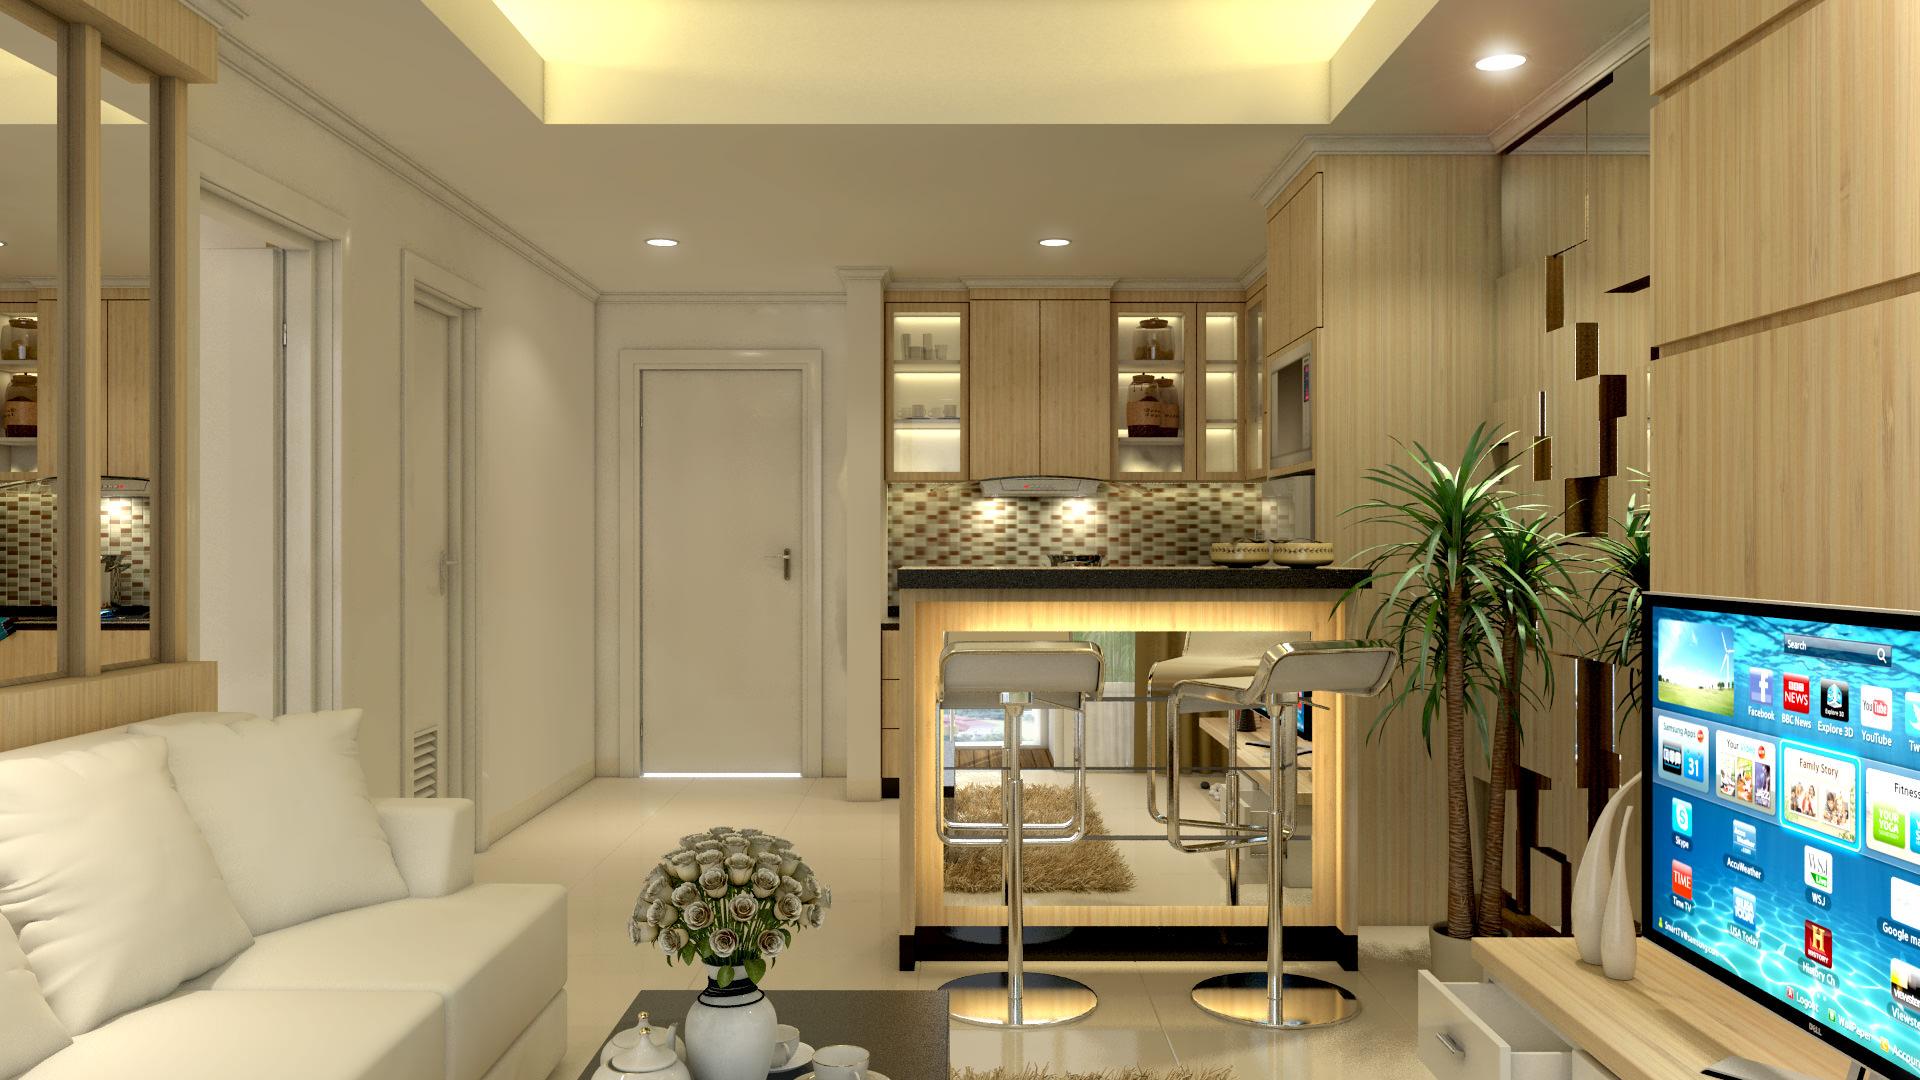 Studio type apartment 3d model max for Com apartment model